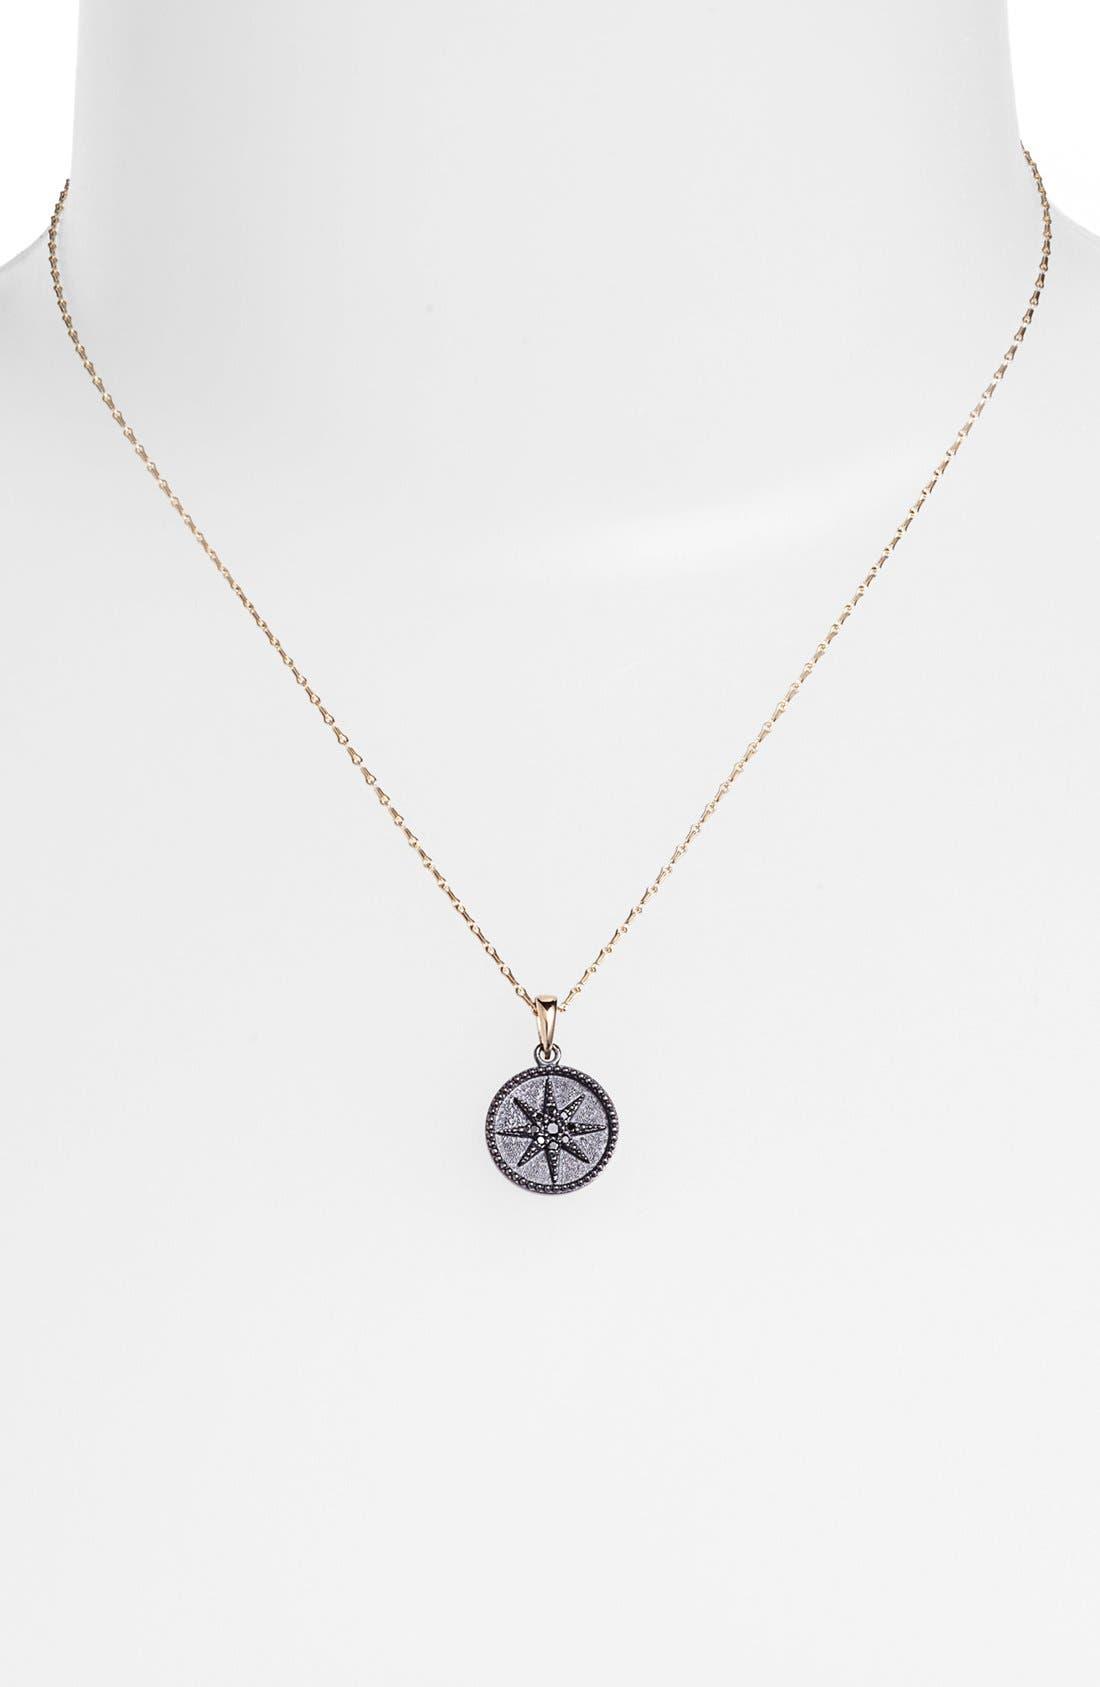 Alternate Image 1 Selected - Mizuki 'Icicles' Black Diamond Star Coin Pendant Necklace